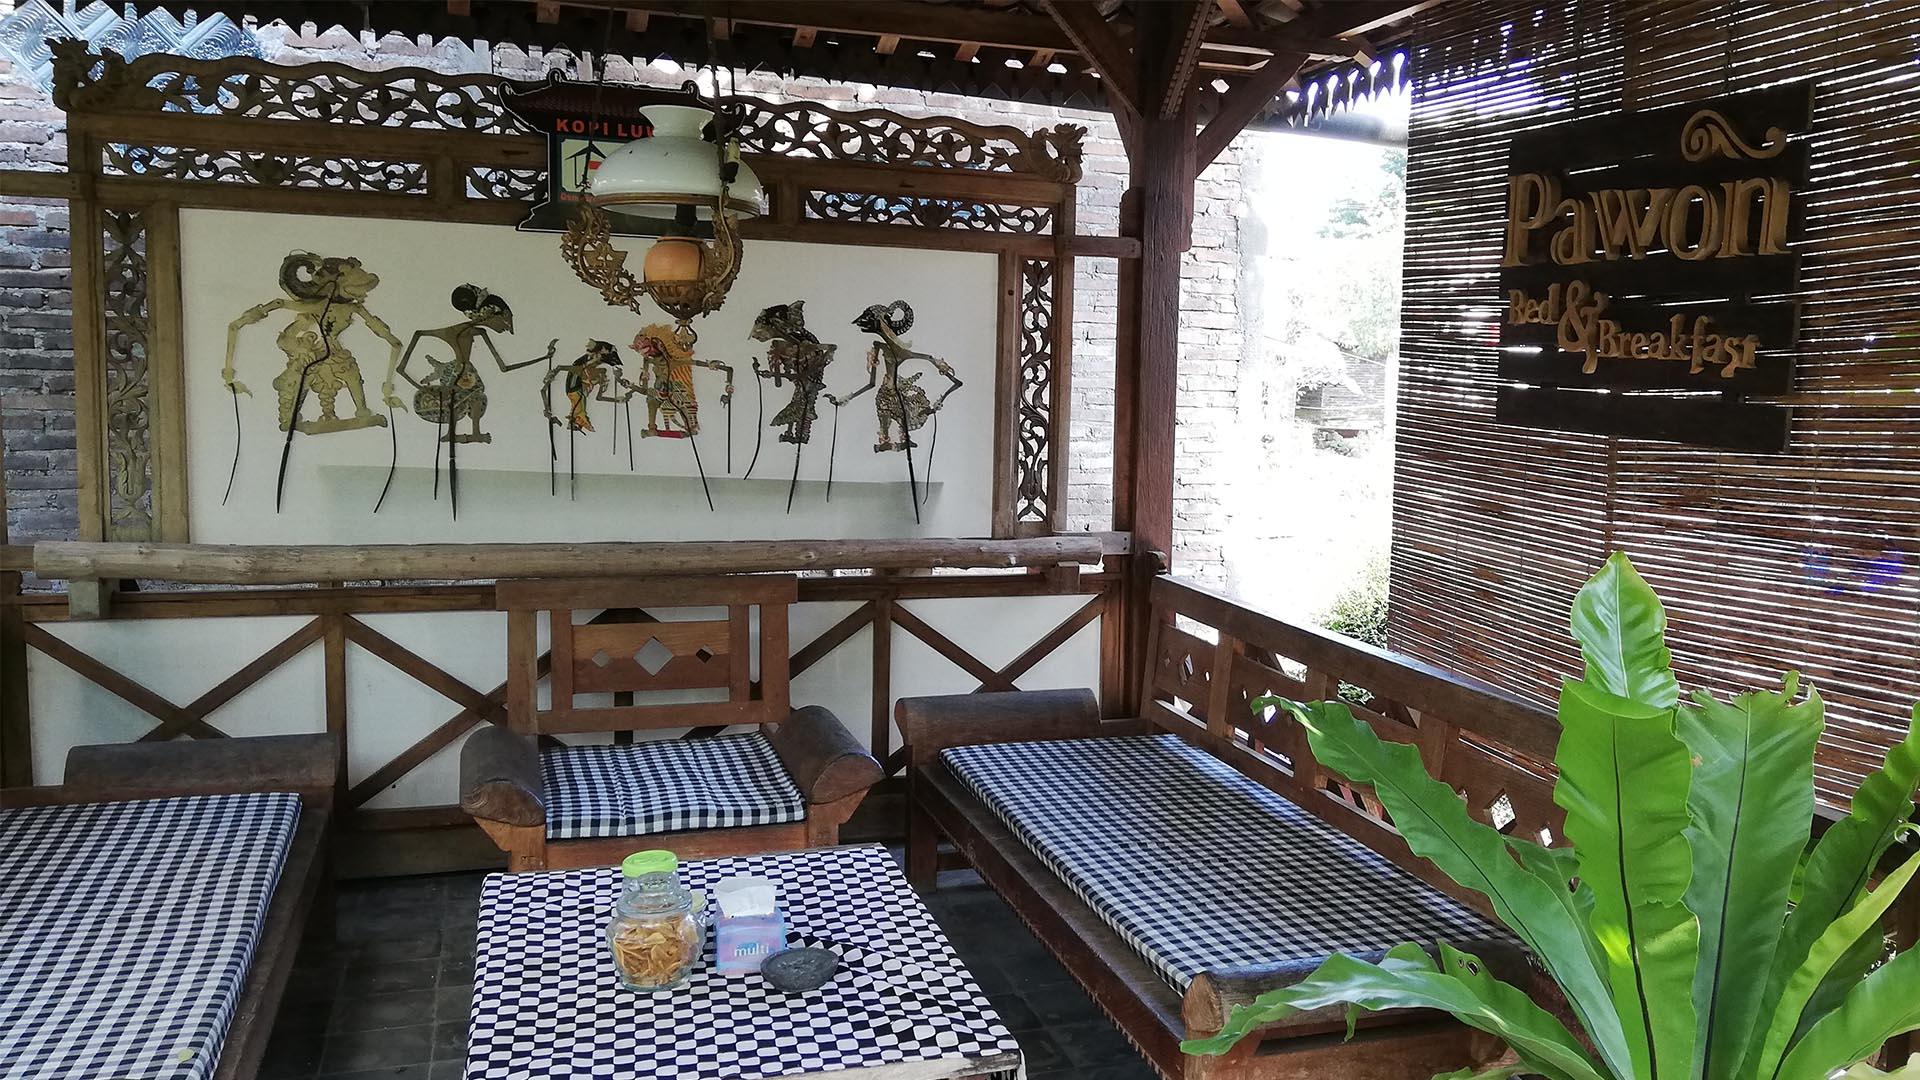 Pawon Luwak Coffee